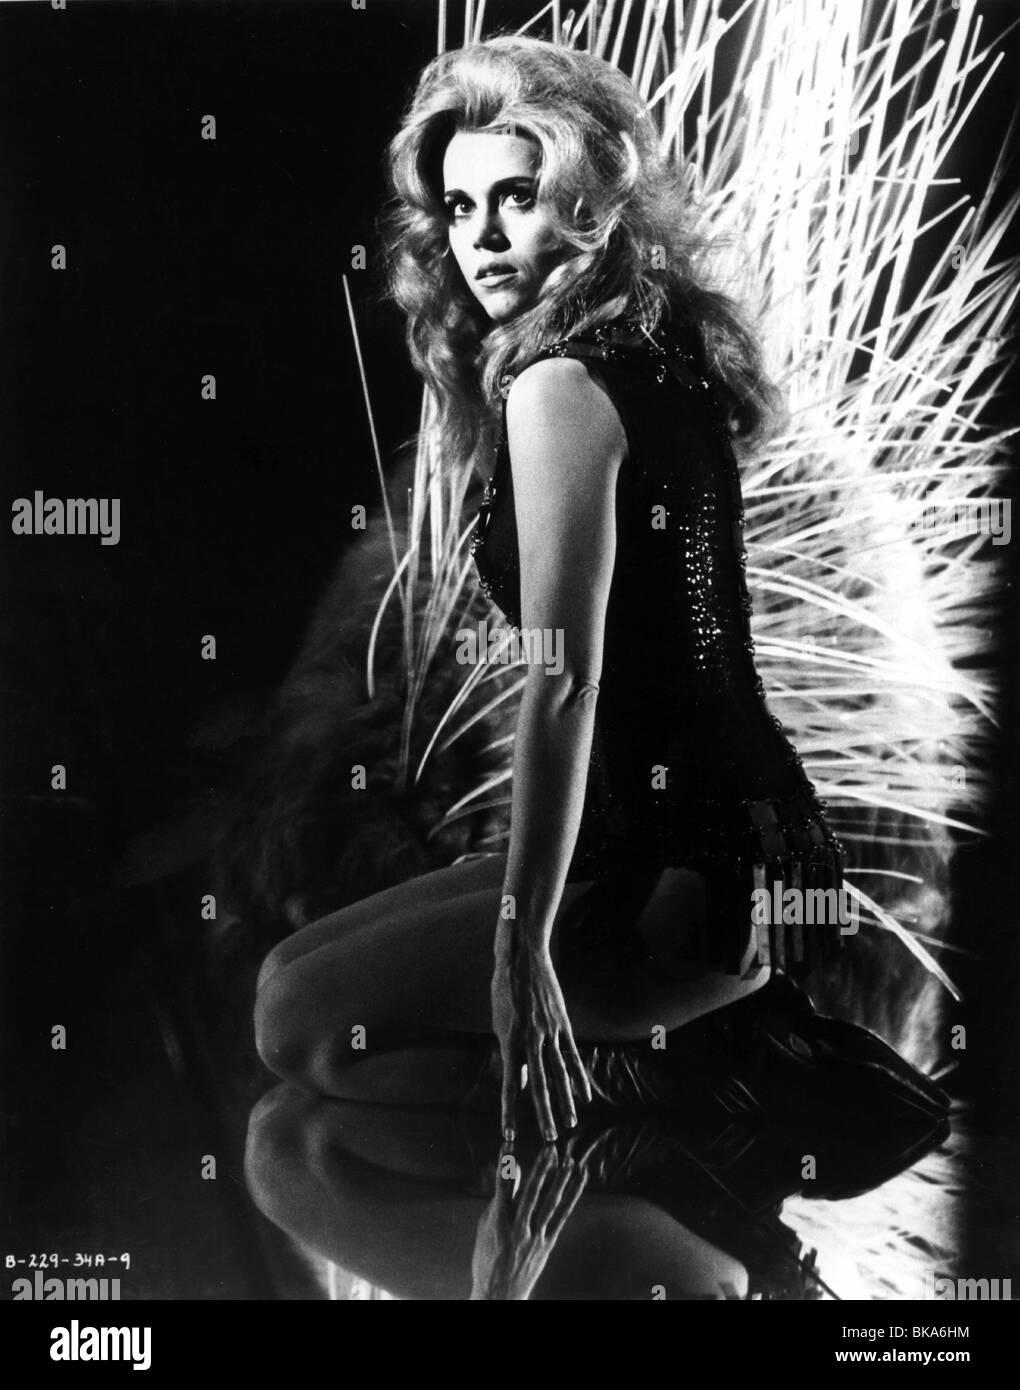 BARBARELLA (1967) JANE FONDA, BARBARELLA BRB 002P - Stock Image